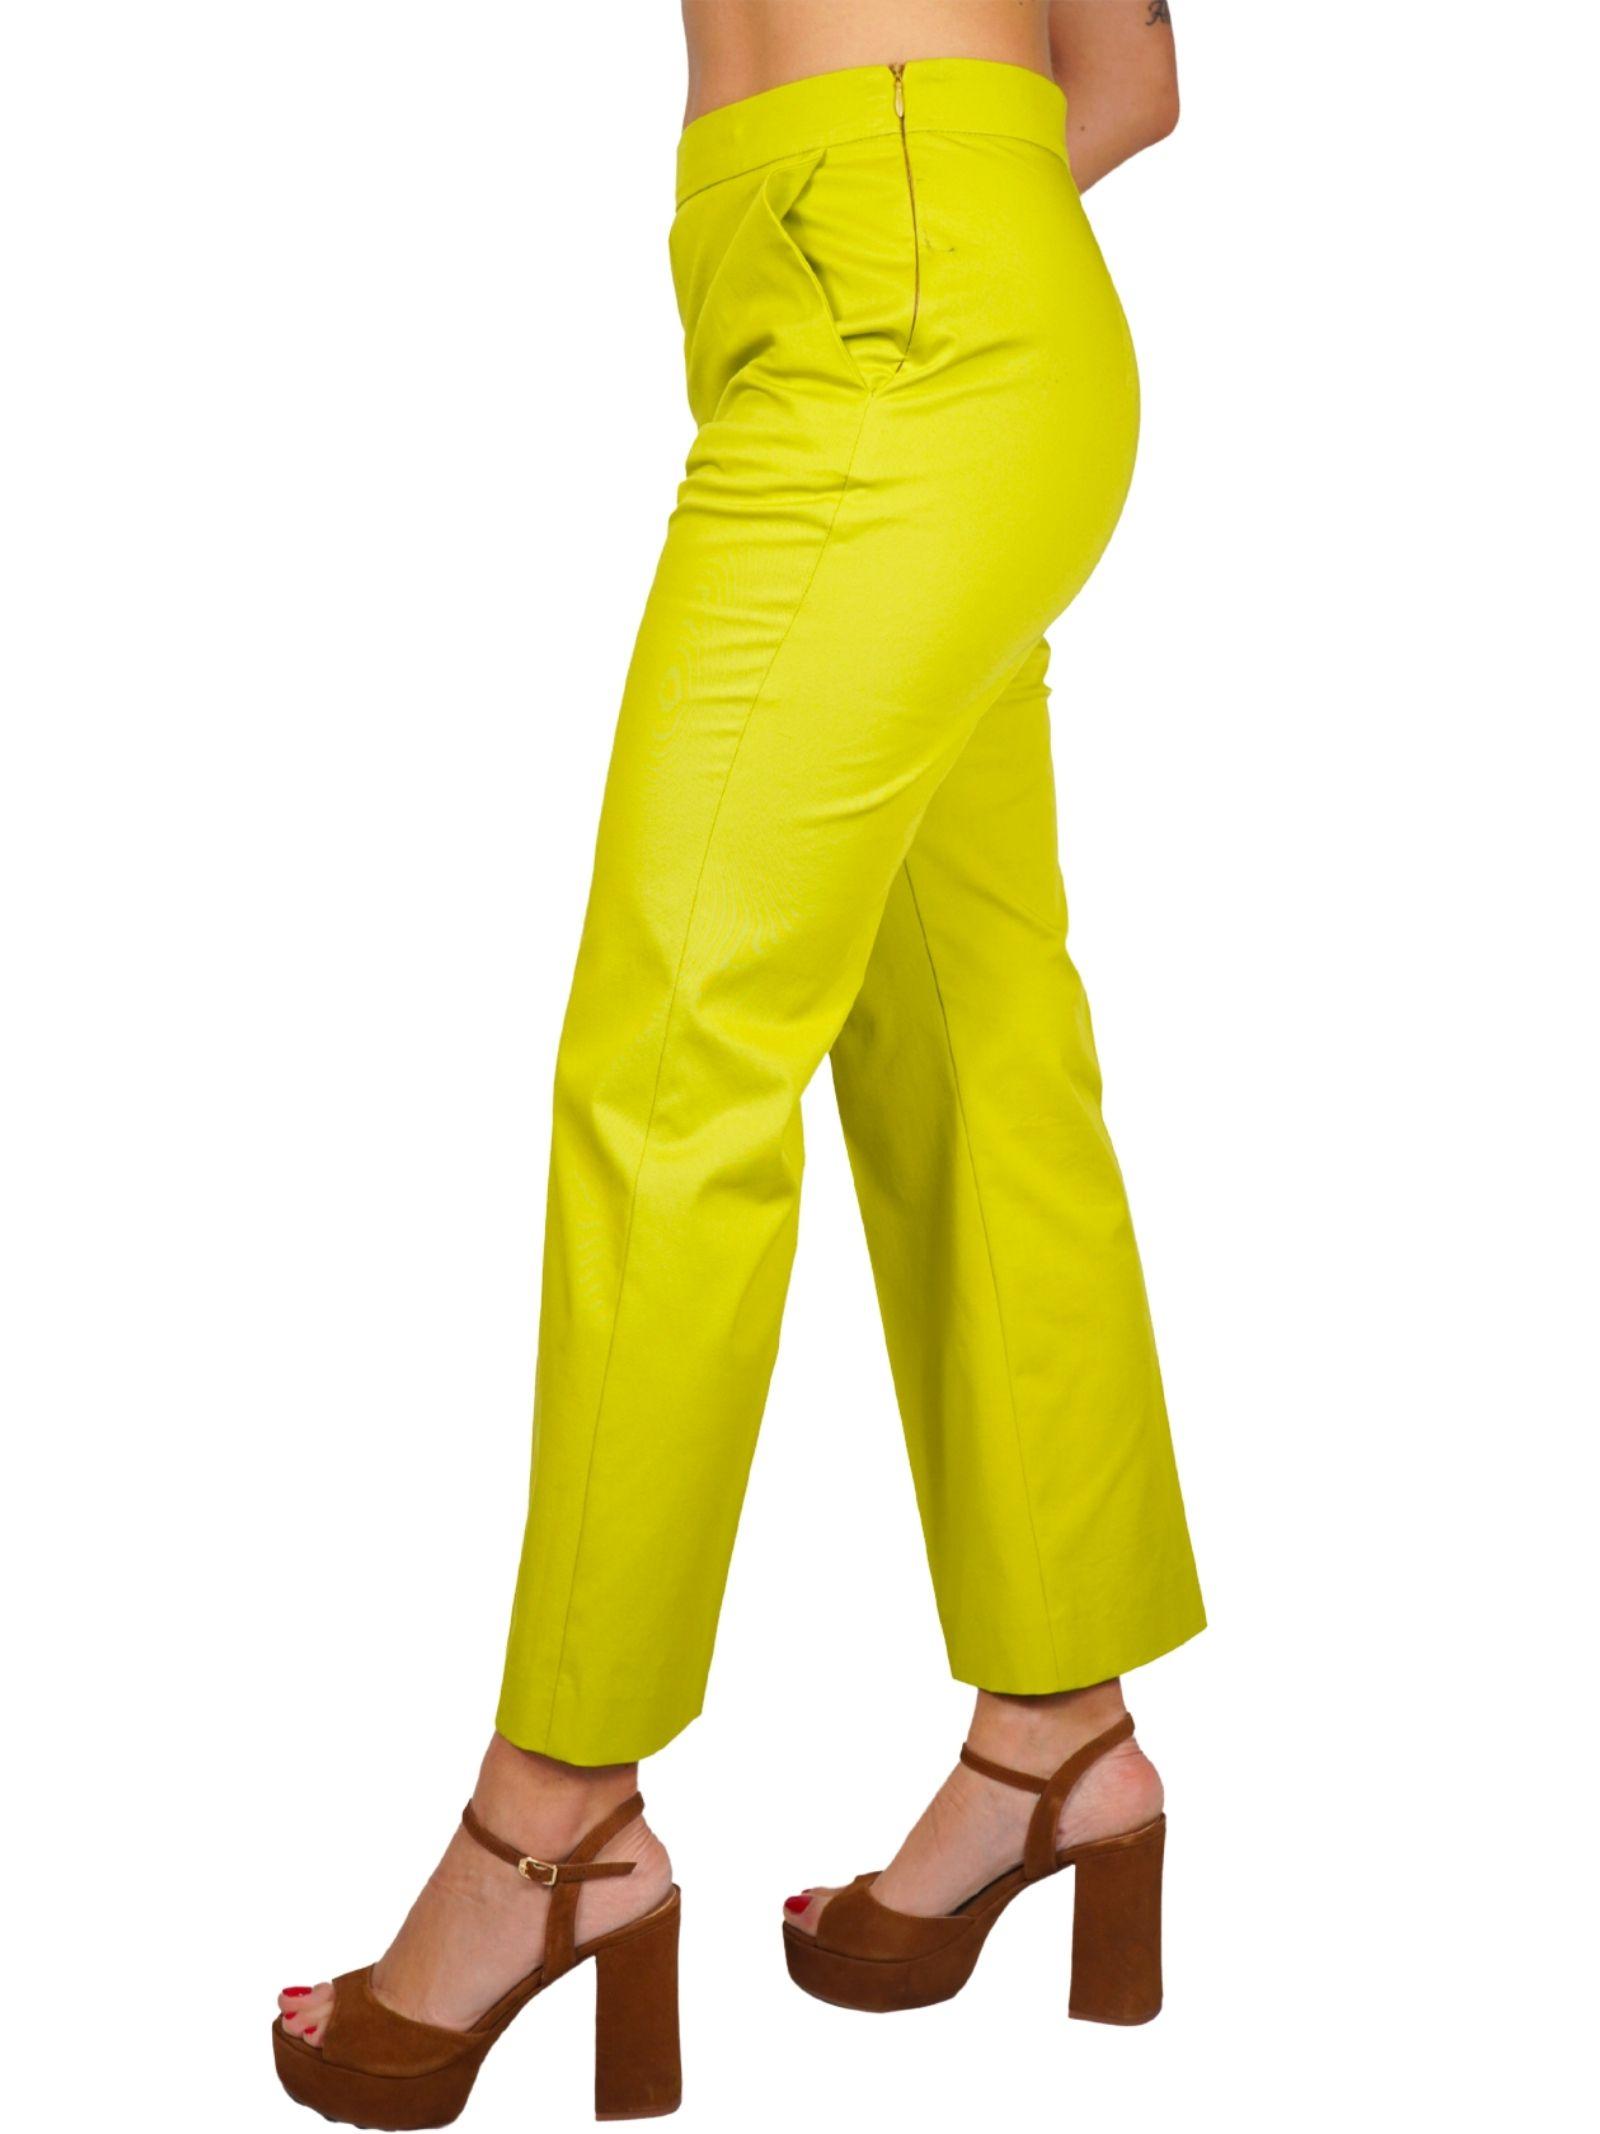 Abbigliamento Donna Pantalone Stretch Gabardine Betulla Maliparmi | Gonne e Pantaloni | JH71441013660120